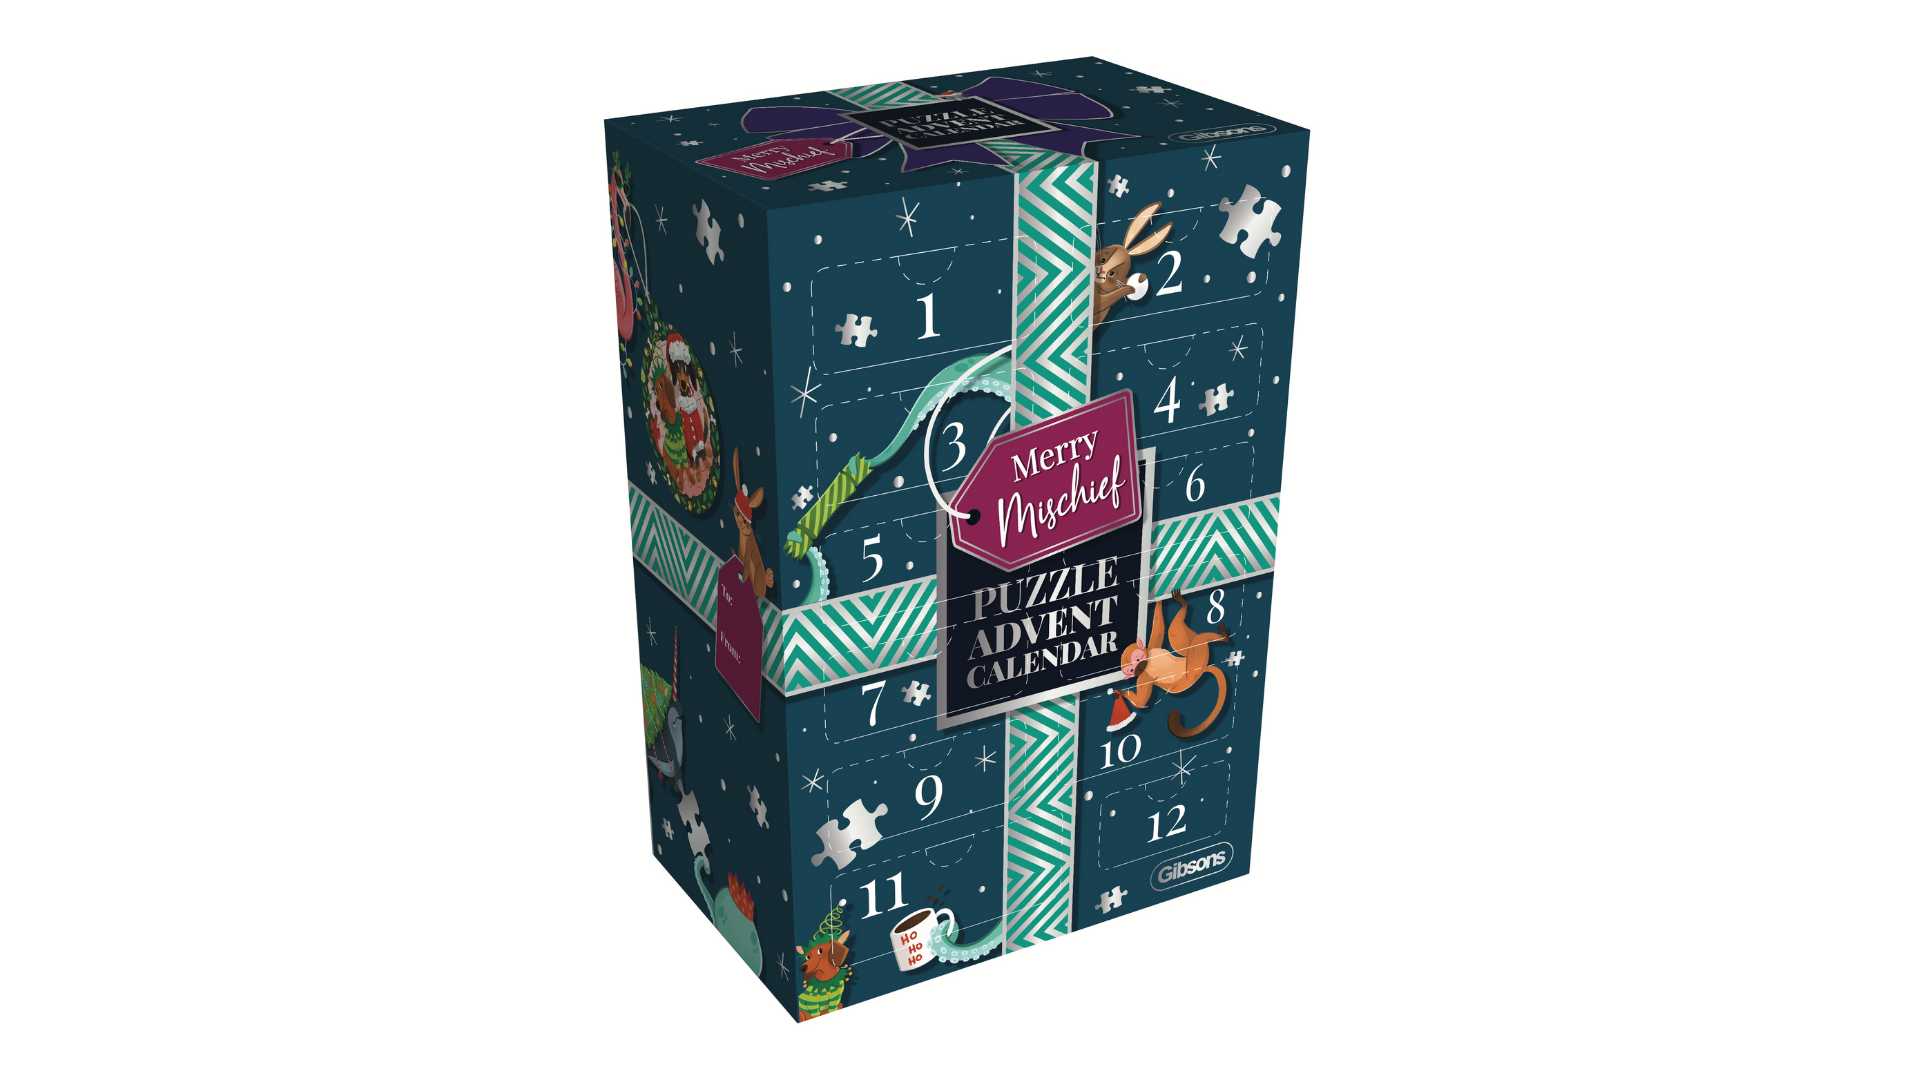 Gibsons Merry Mischief puzzle advent calendar 2021 (12 puzzles)